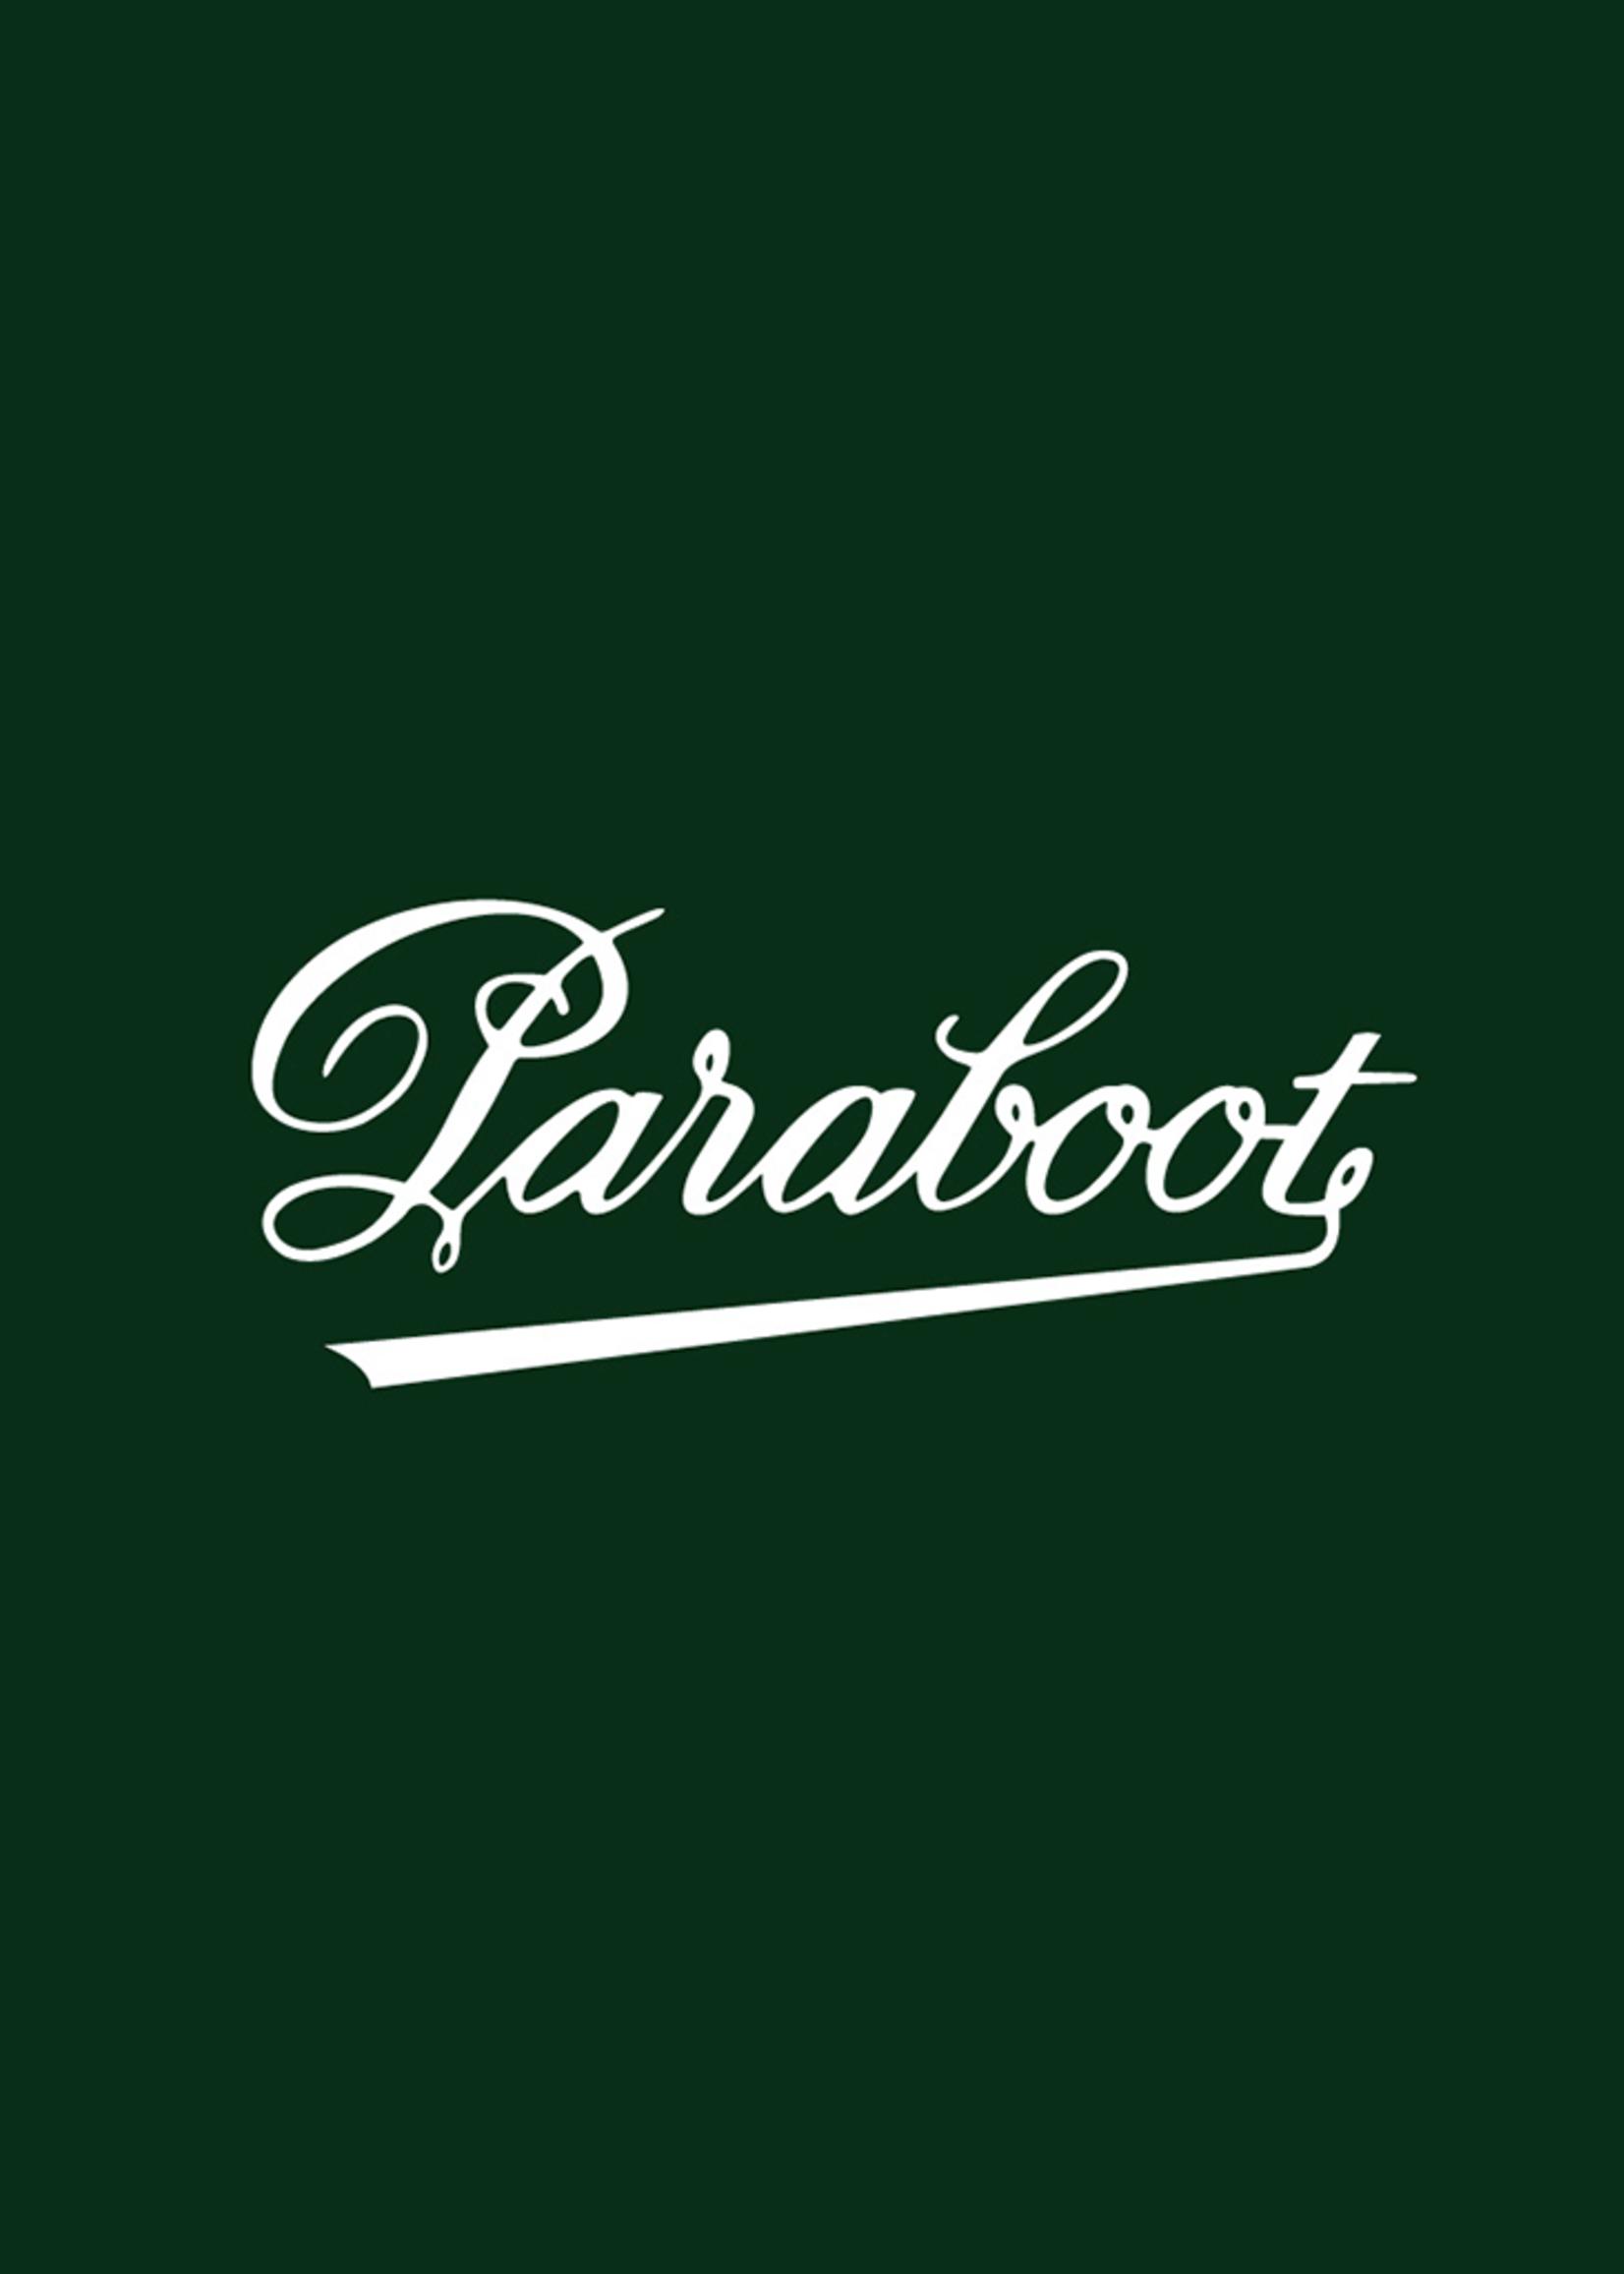 Paraboot Chambord Cafe Moc Toe by Paraboot